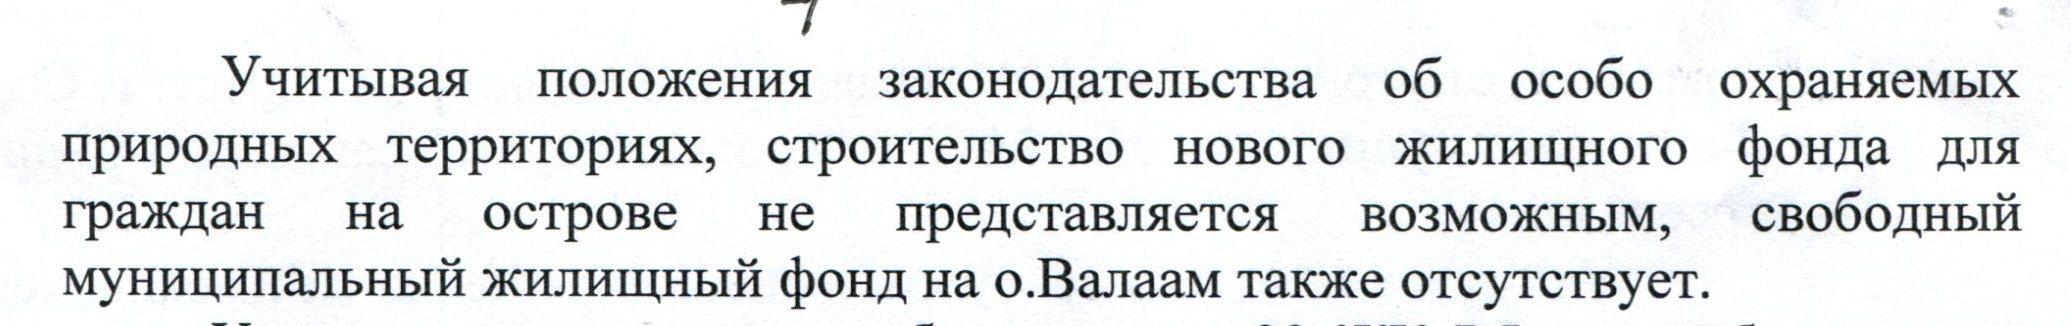 Скрин 6